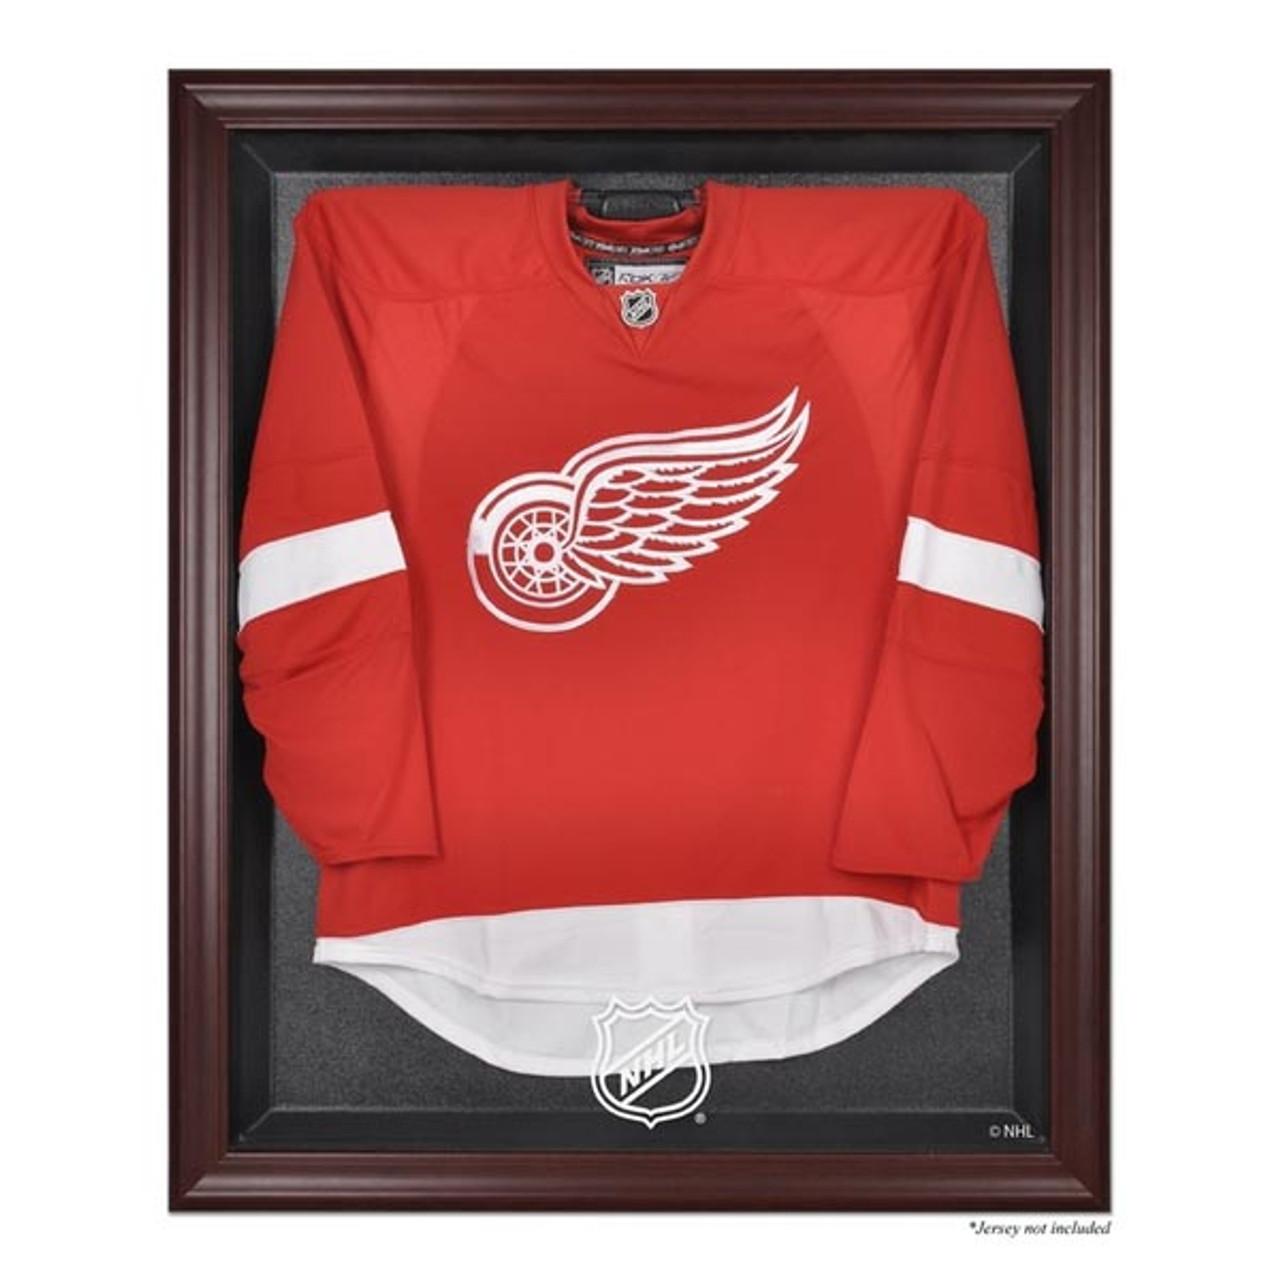 timeless design a0861 e5a98 Mahogany Framed Jersey NHL Logo Display Case